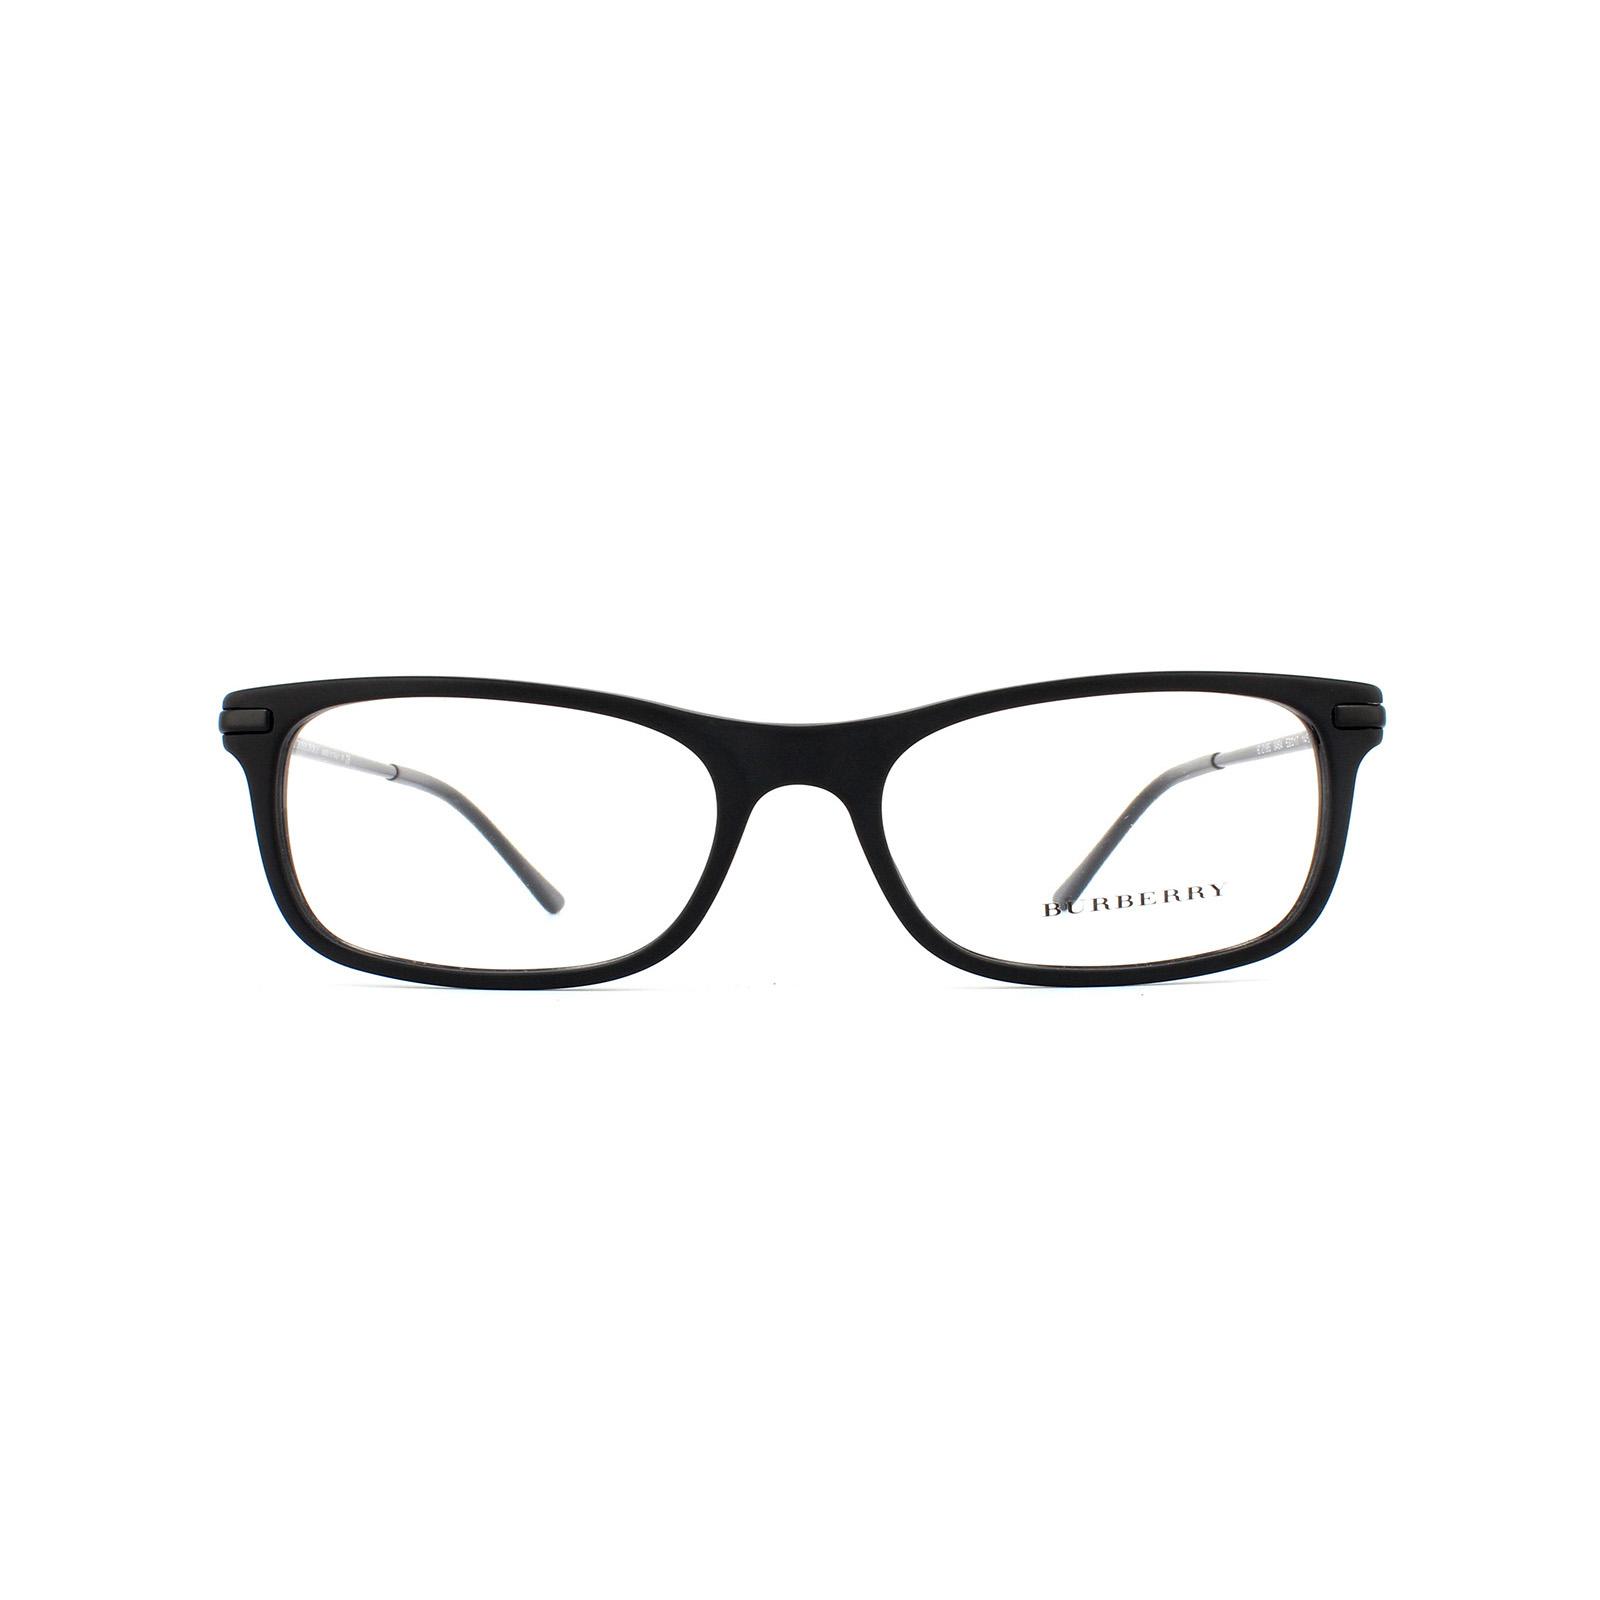 33b87f93e51 Sentinel Burberry Glasses Frames 2195 3464 Matte Black Womens 55mm